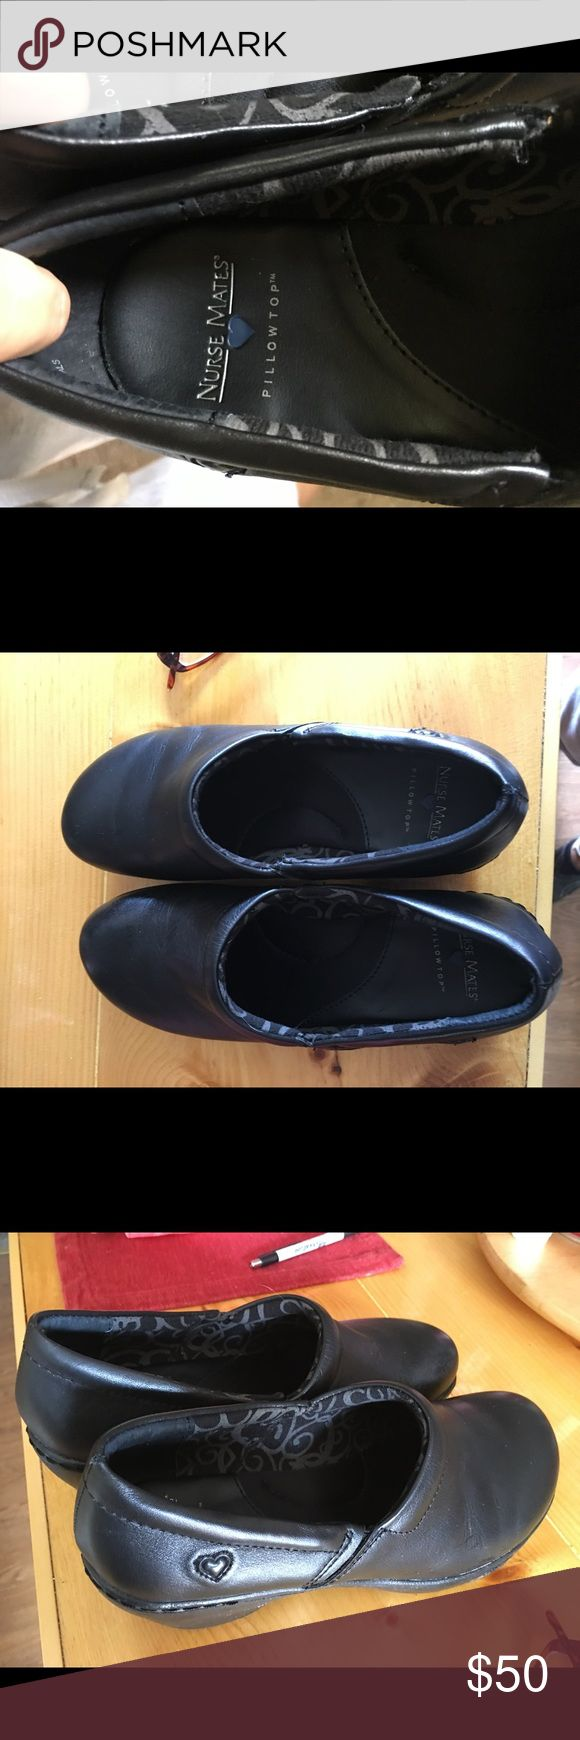 Londonderry nh Nursing shoes Shoes Mules & Clogs